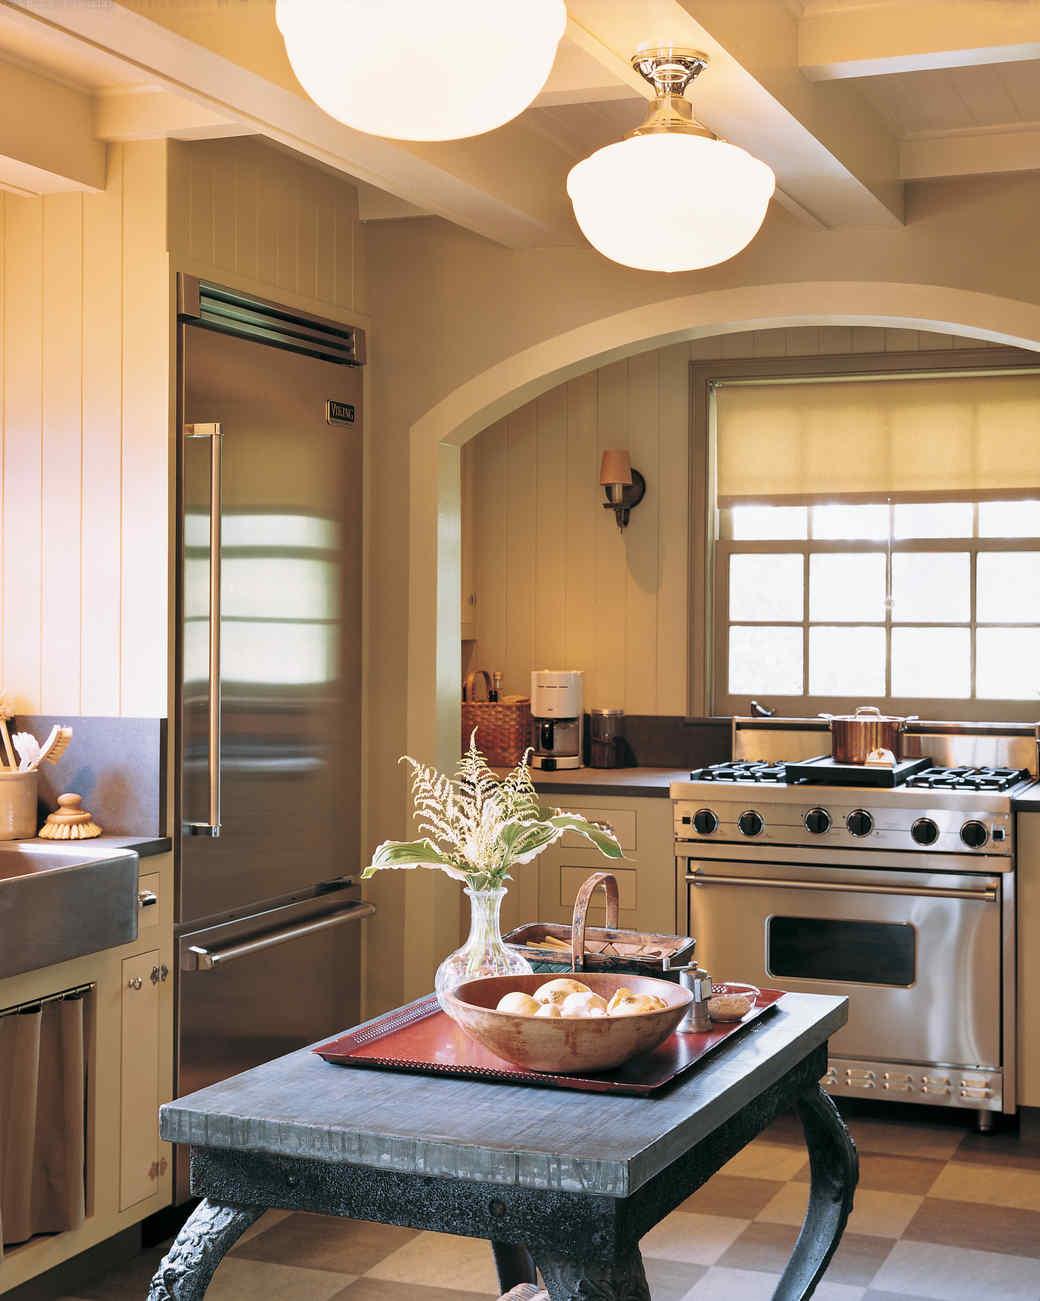 13 Common Kitchen Renovation Mistakes to Avoid | Martha Stewart